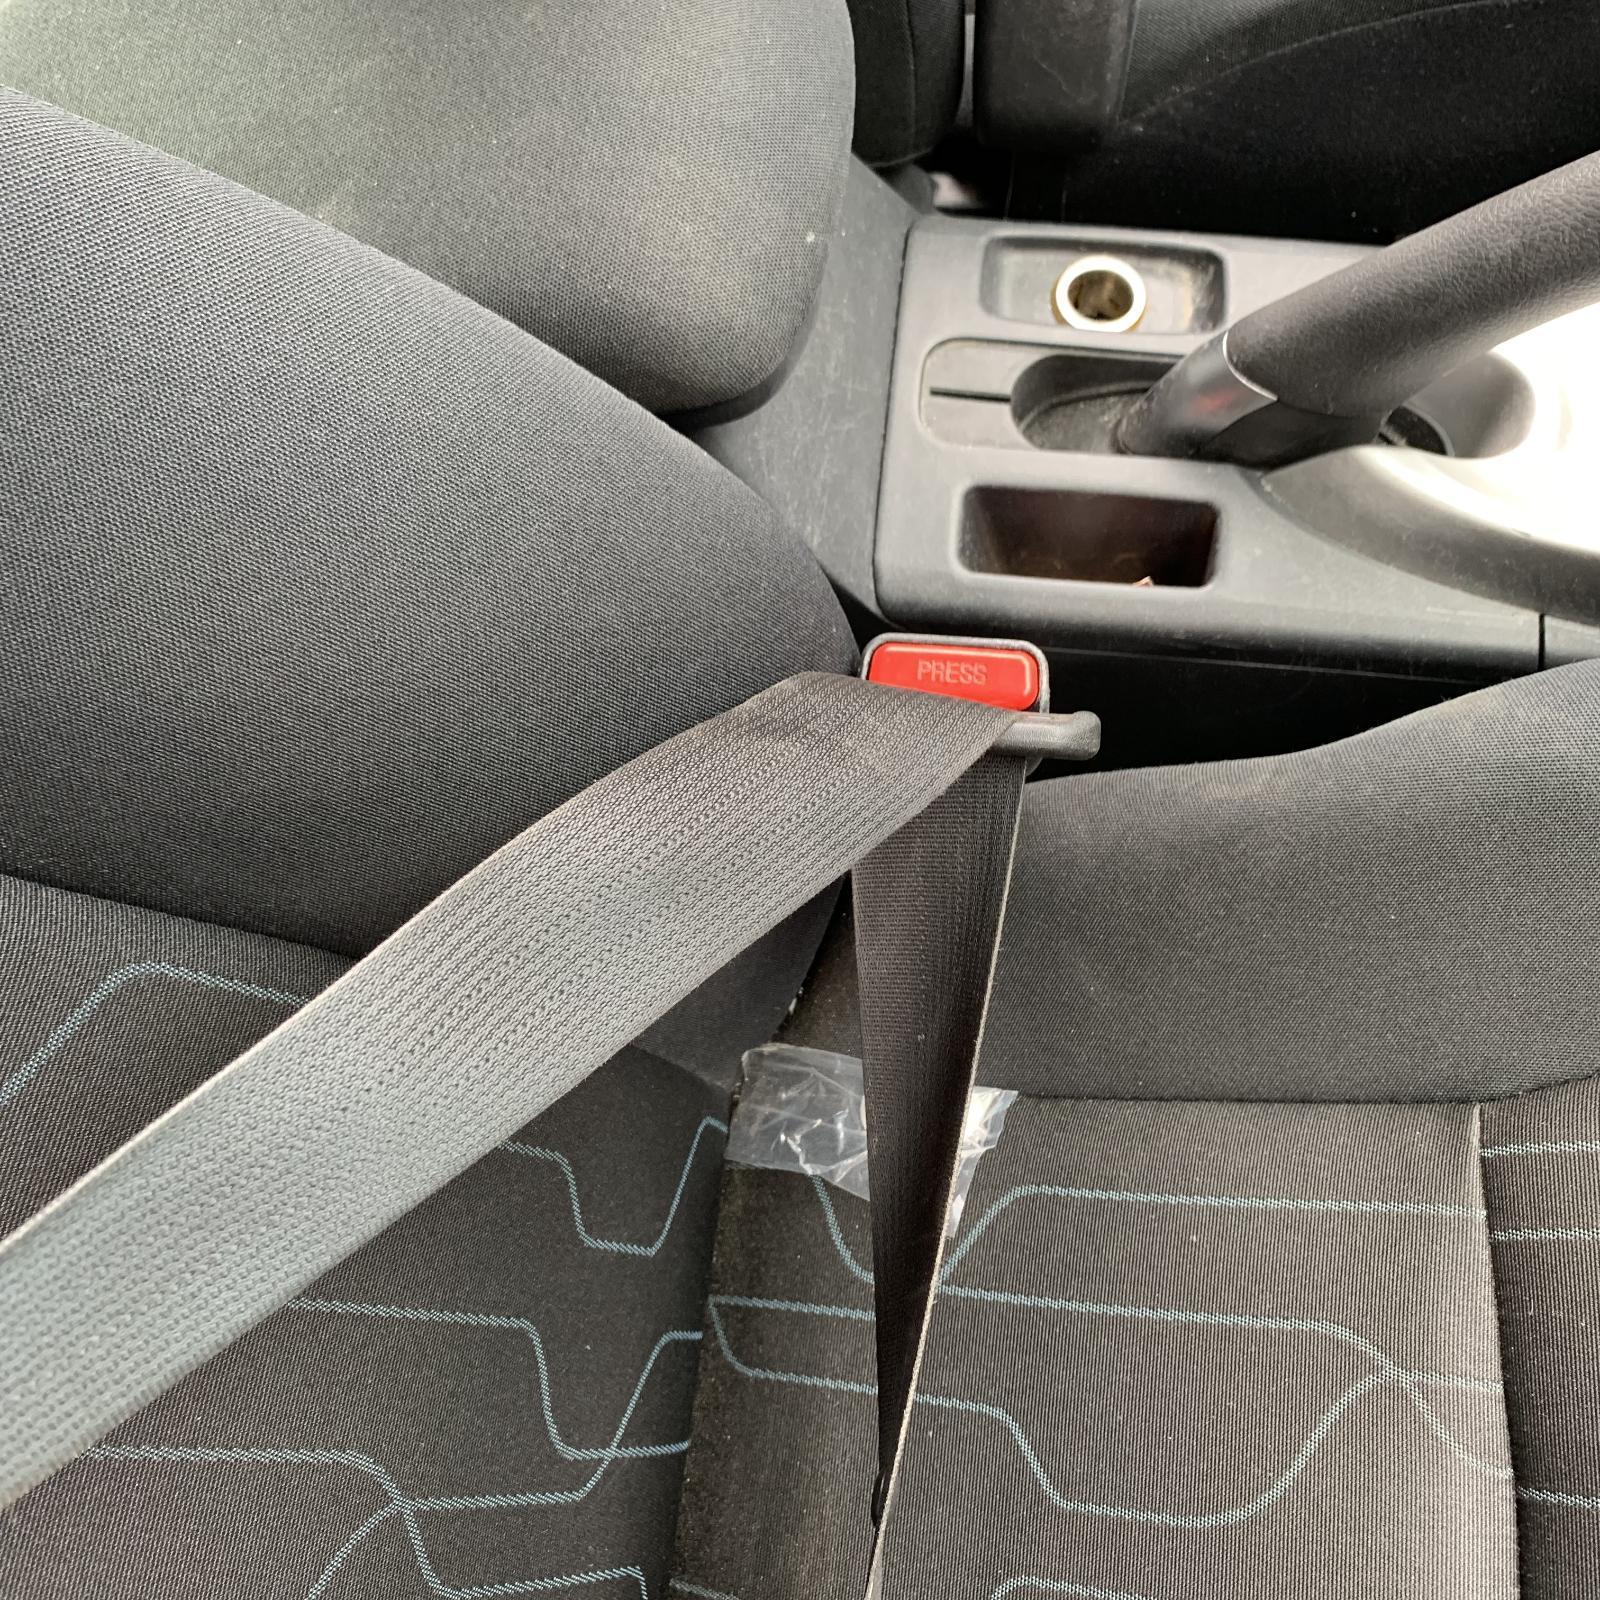 TOYOTA COROLLA, Seatbelt/Stalk, RH FRONT, SEAT BELT ONLY, ZRE152/153R, 03/07-10/13